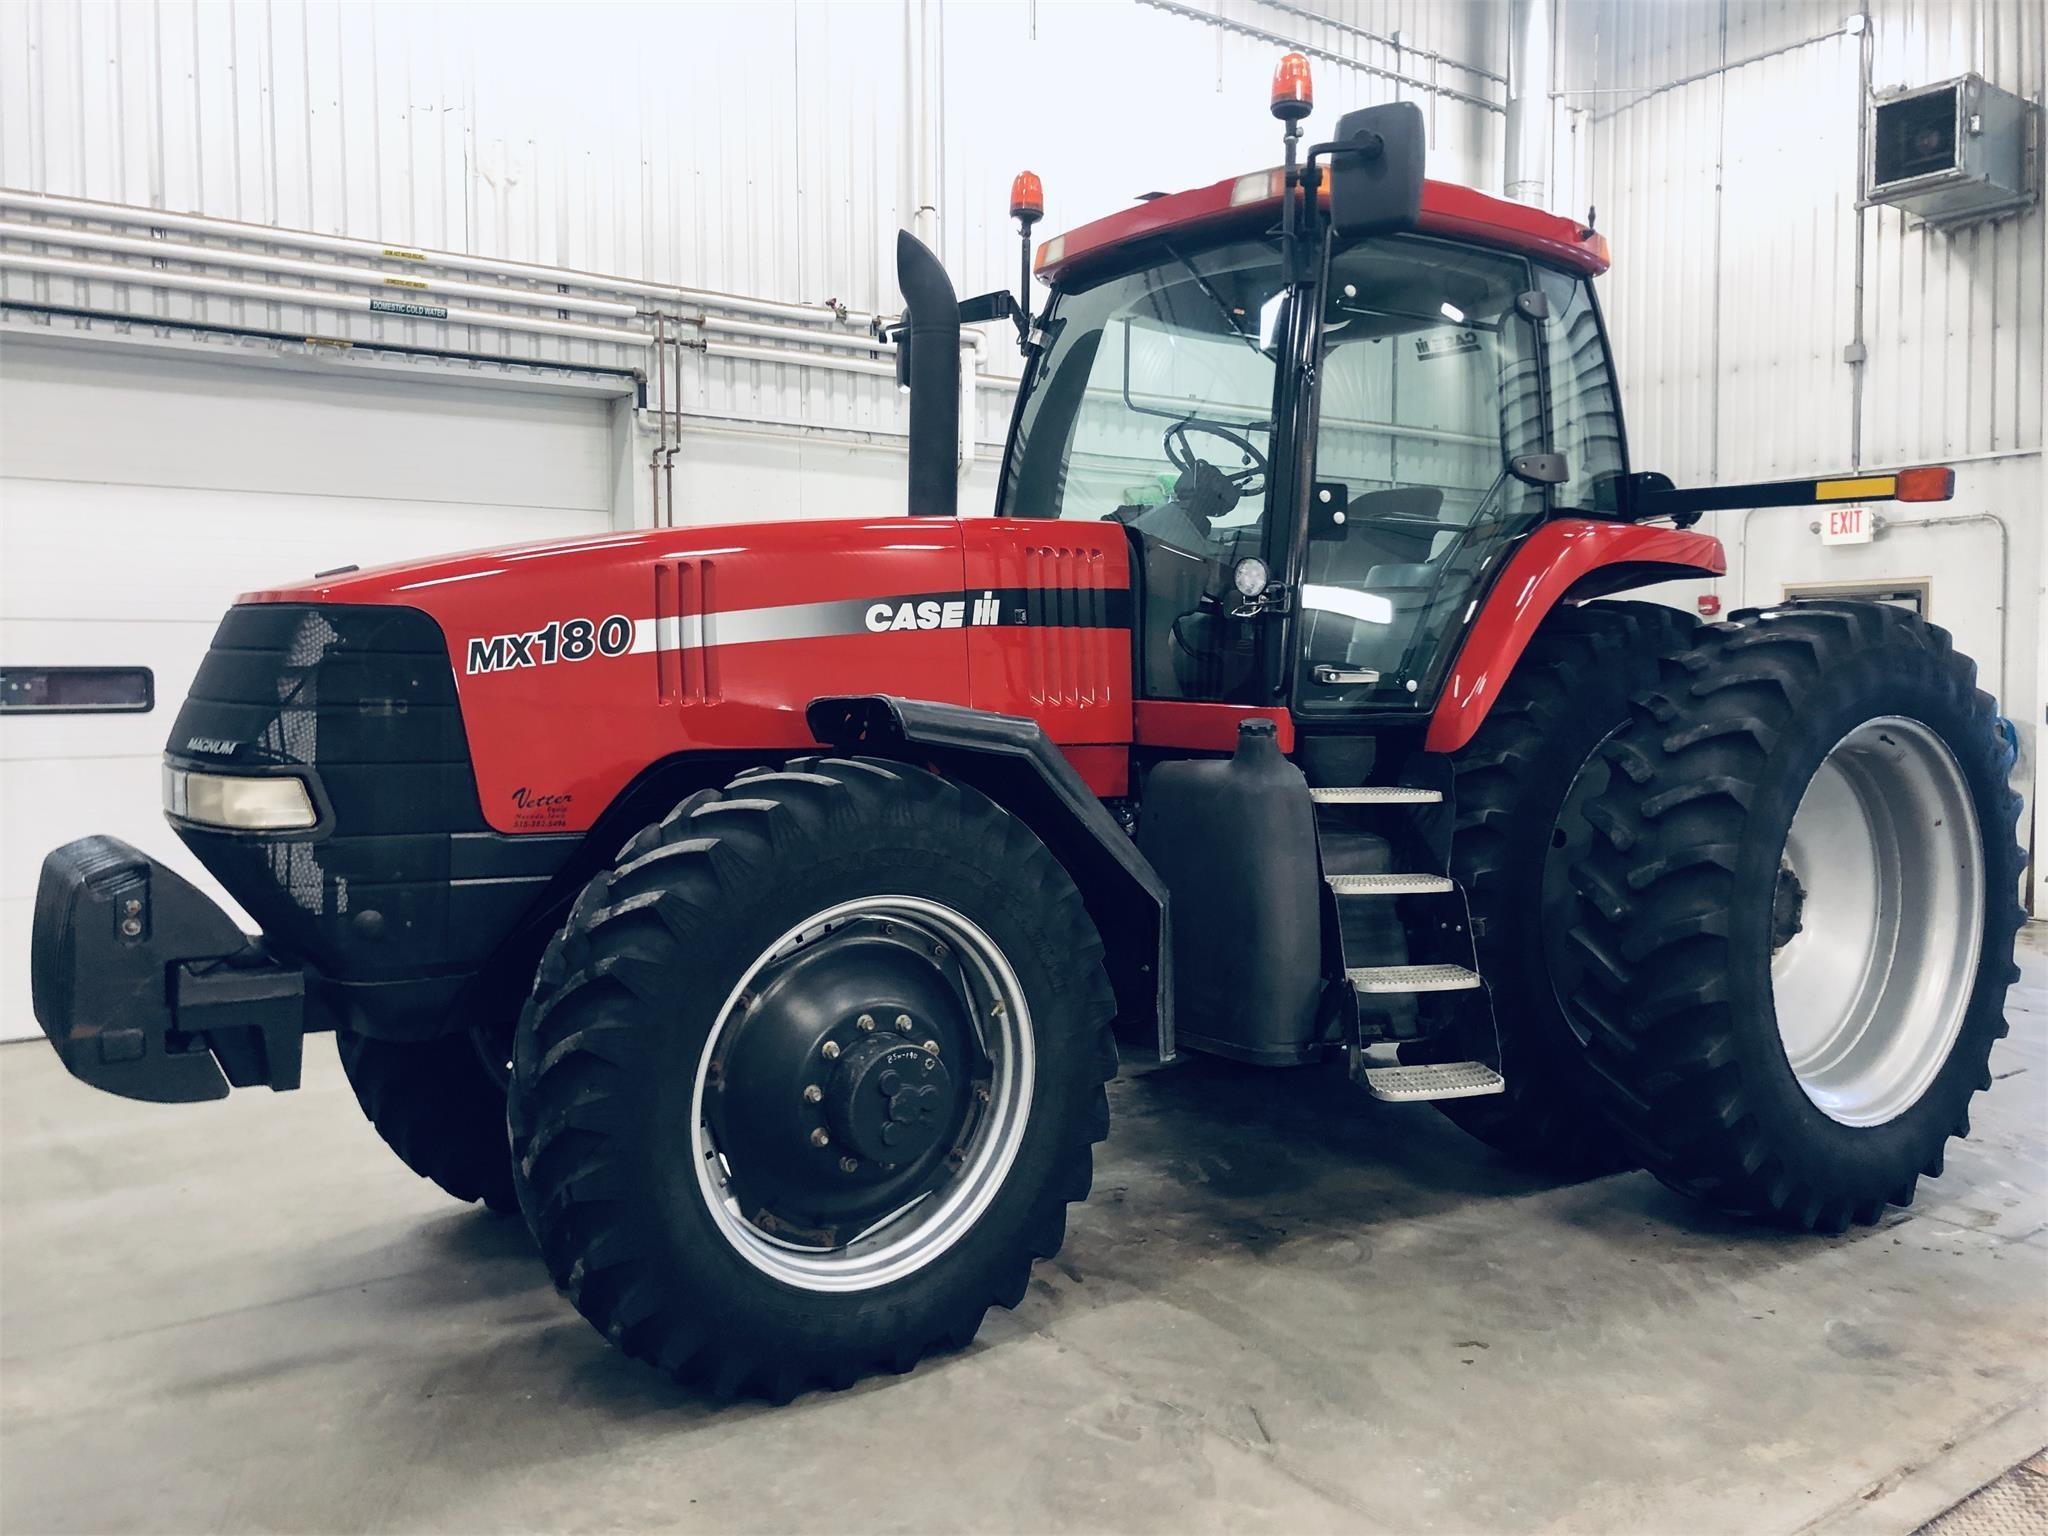 1999 Case IH MX180 Tractor